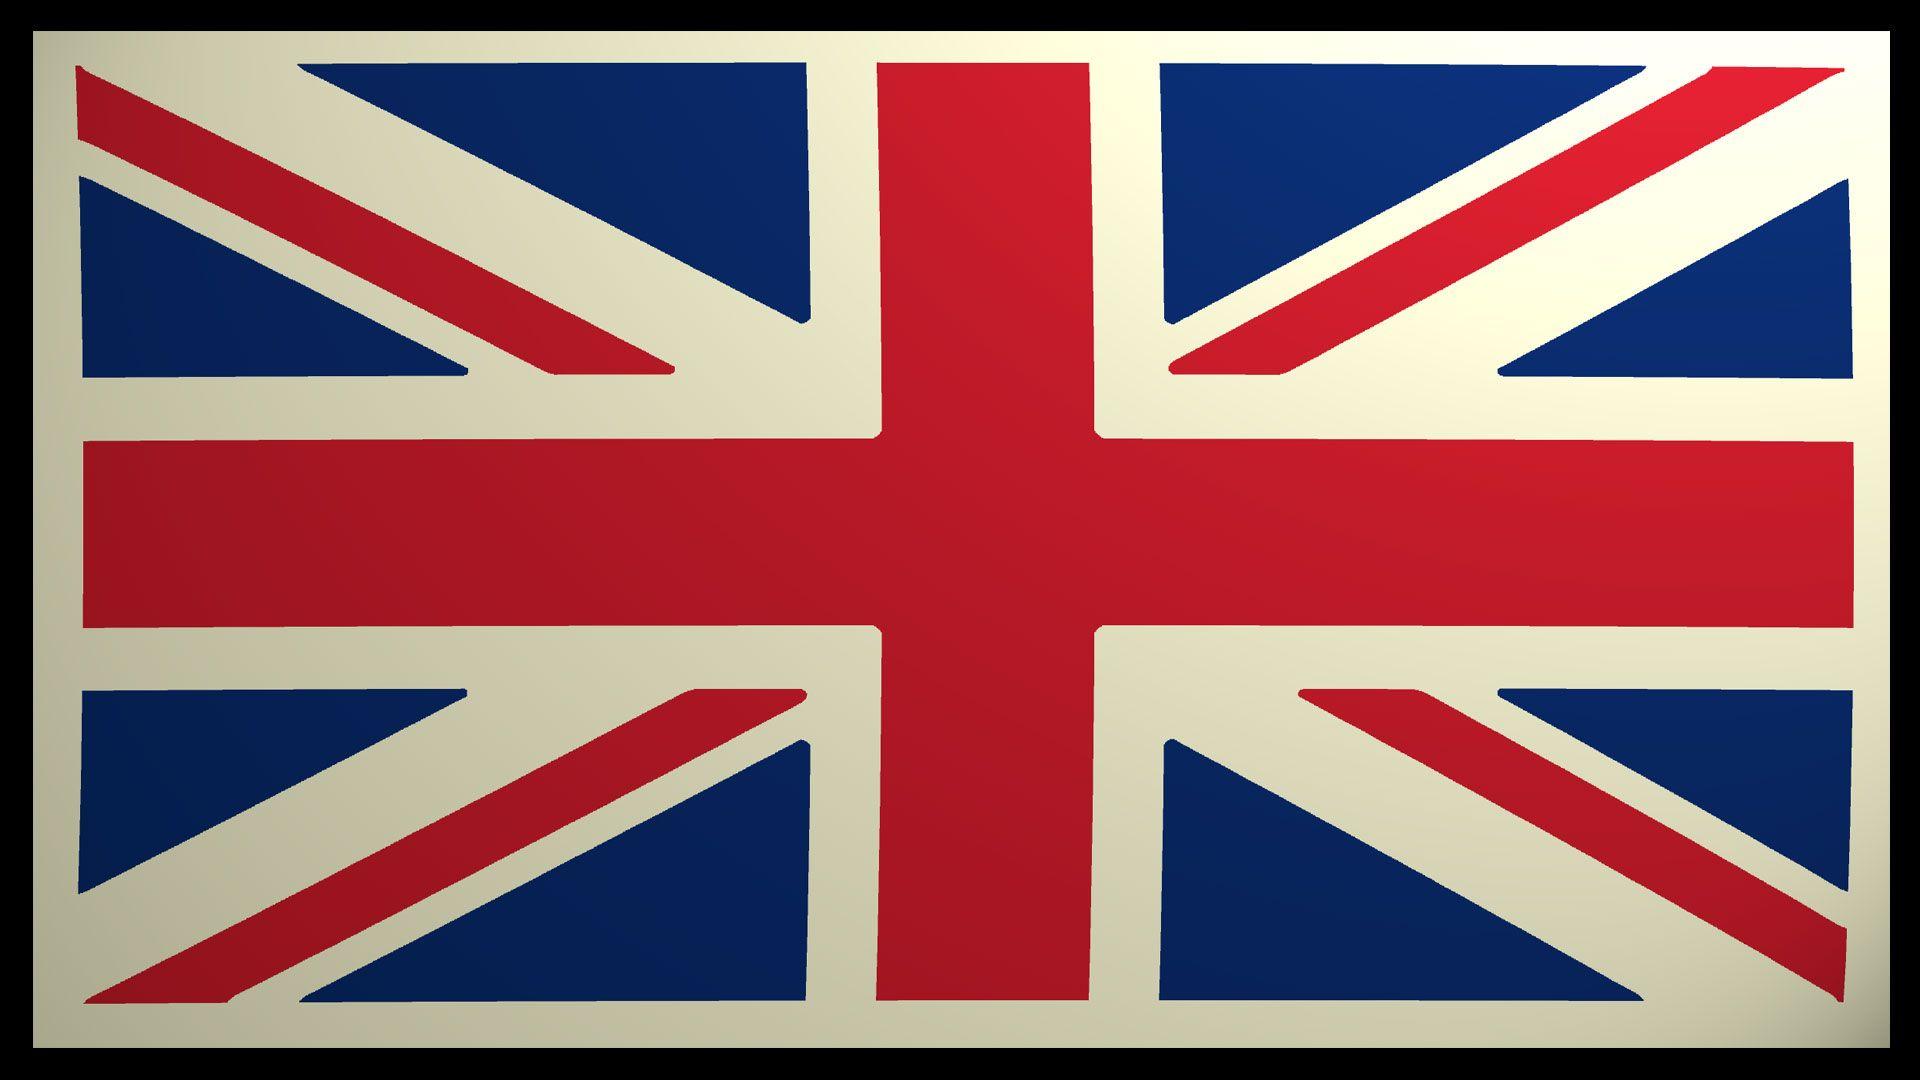 1920x1080 uk flag wall - photo #12